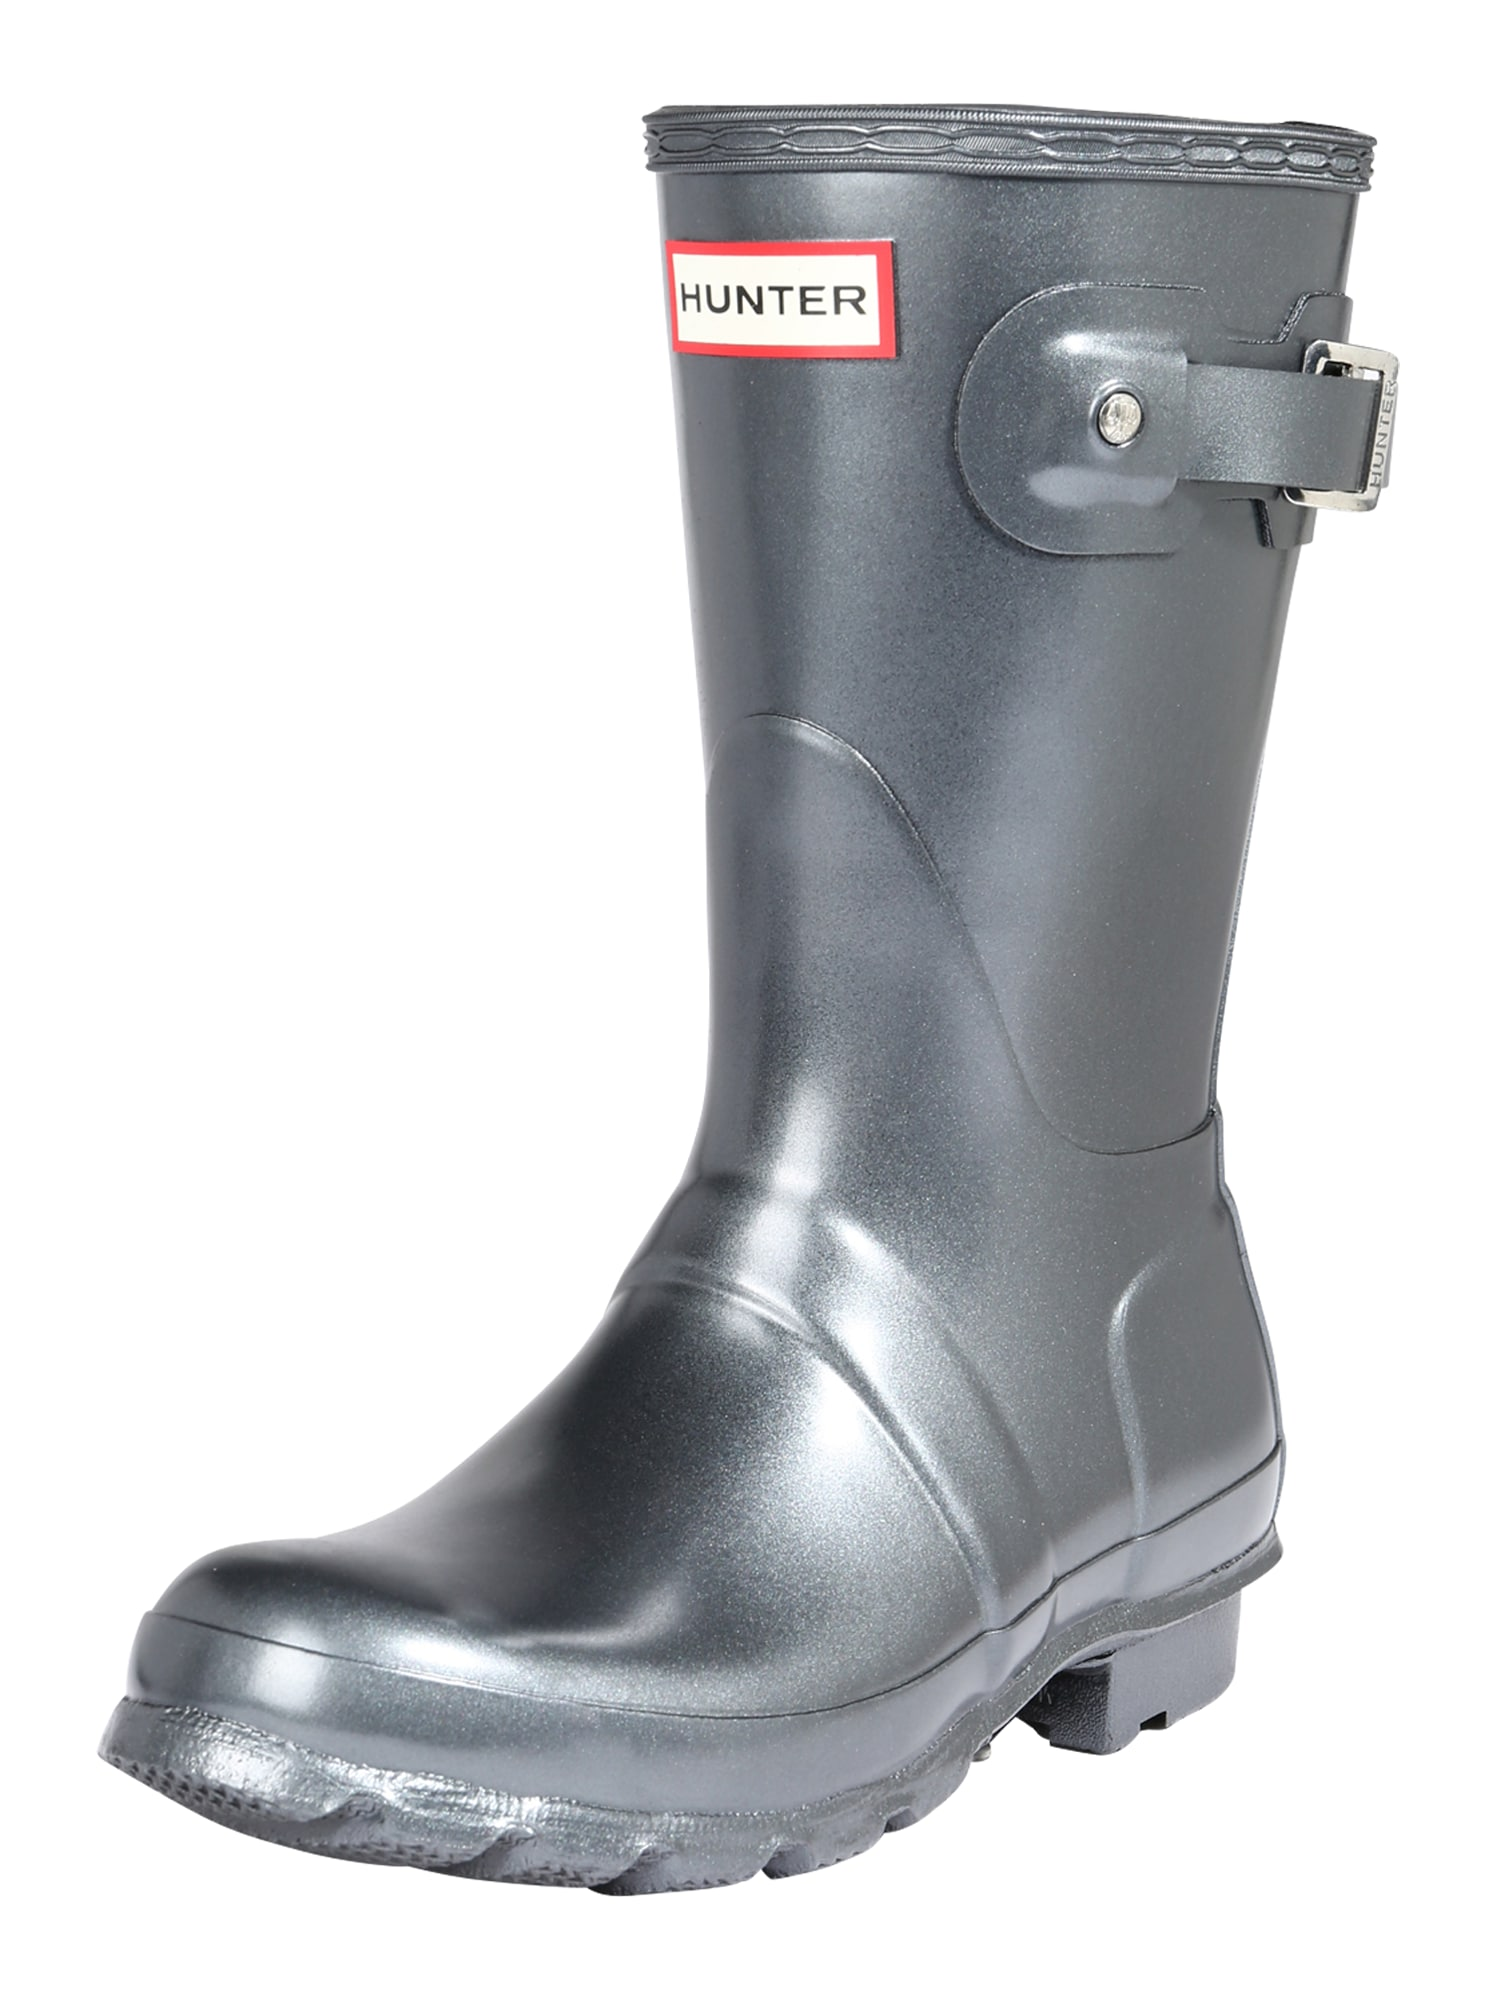 HUNTER Guminiai batai sidabro pilka